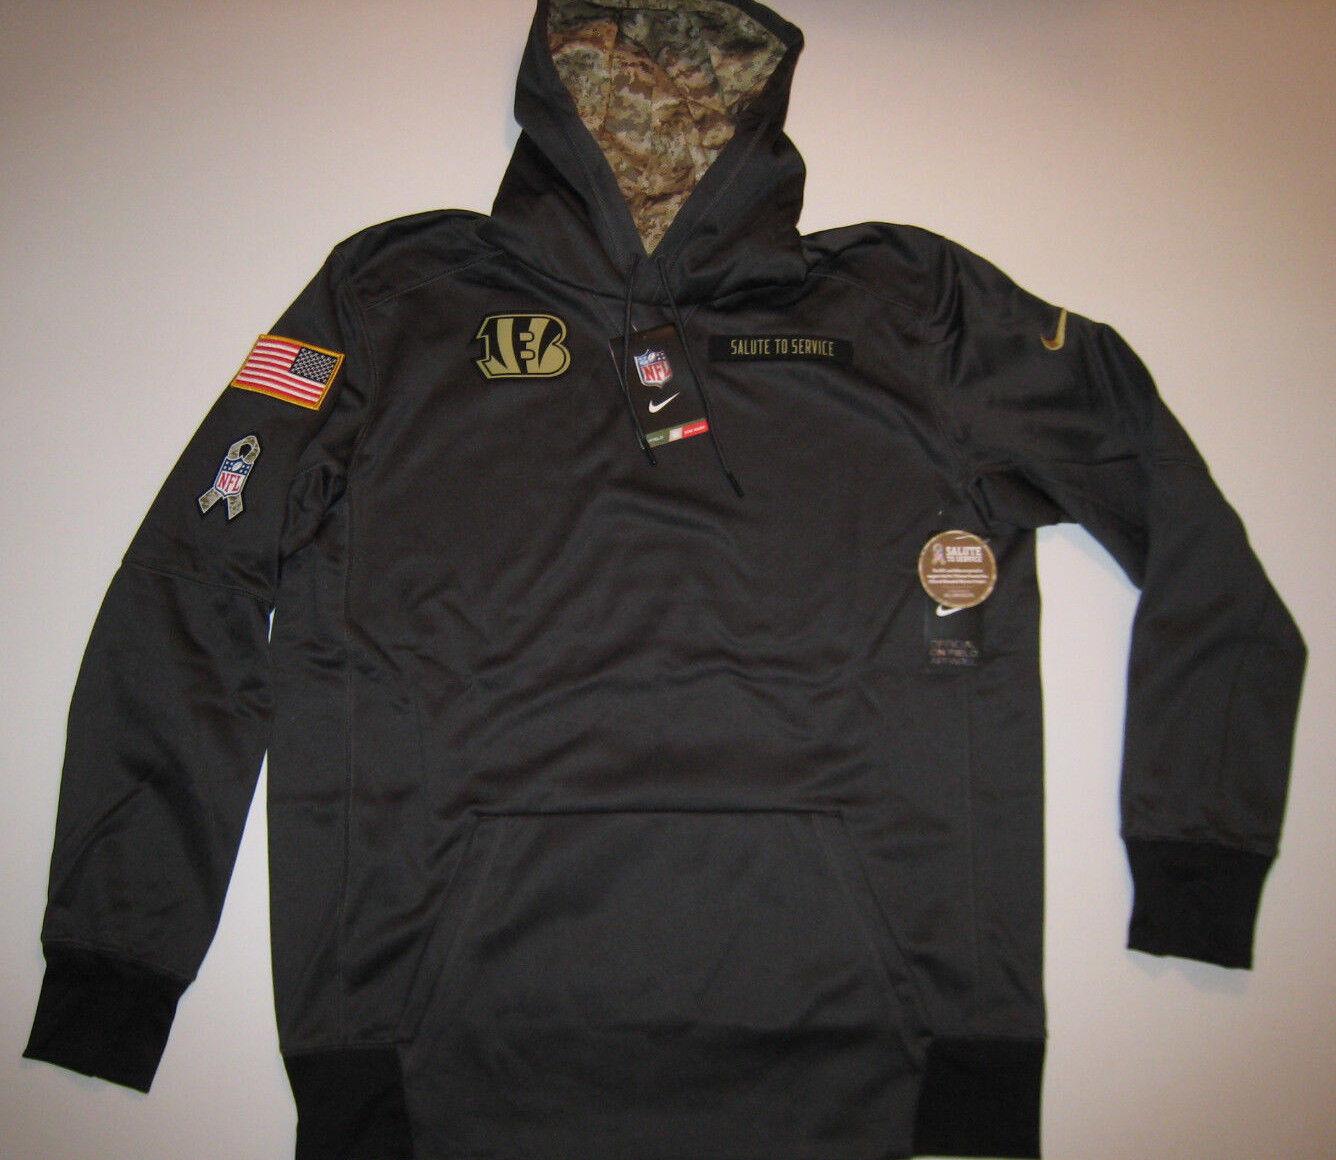 cheaper 20cb4 46b0d Cincinnati Bengals Nike NFL Mens Salute to Service Hoodie Sweatshirt 90487 M